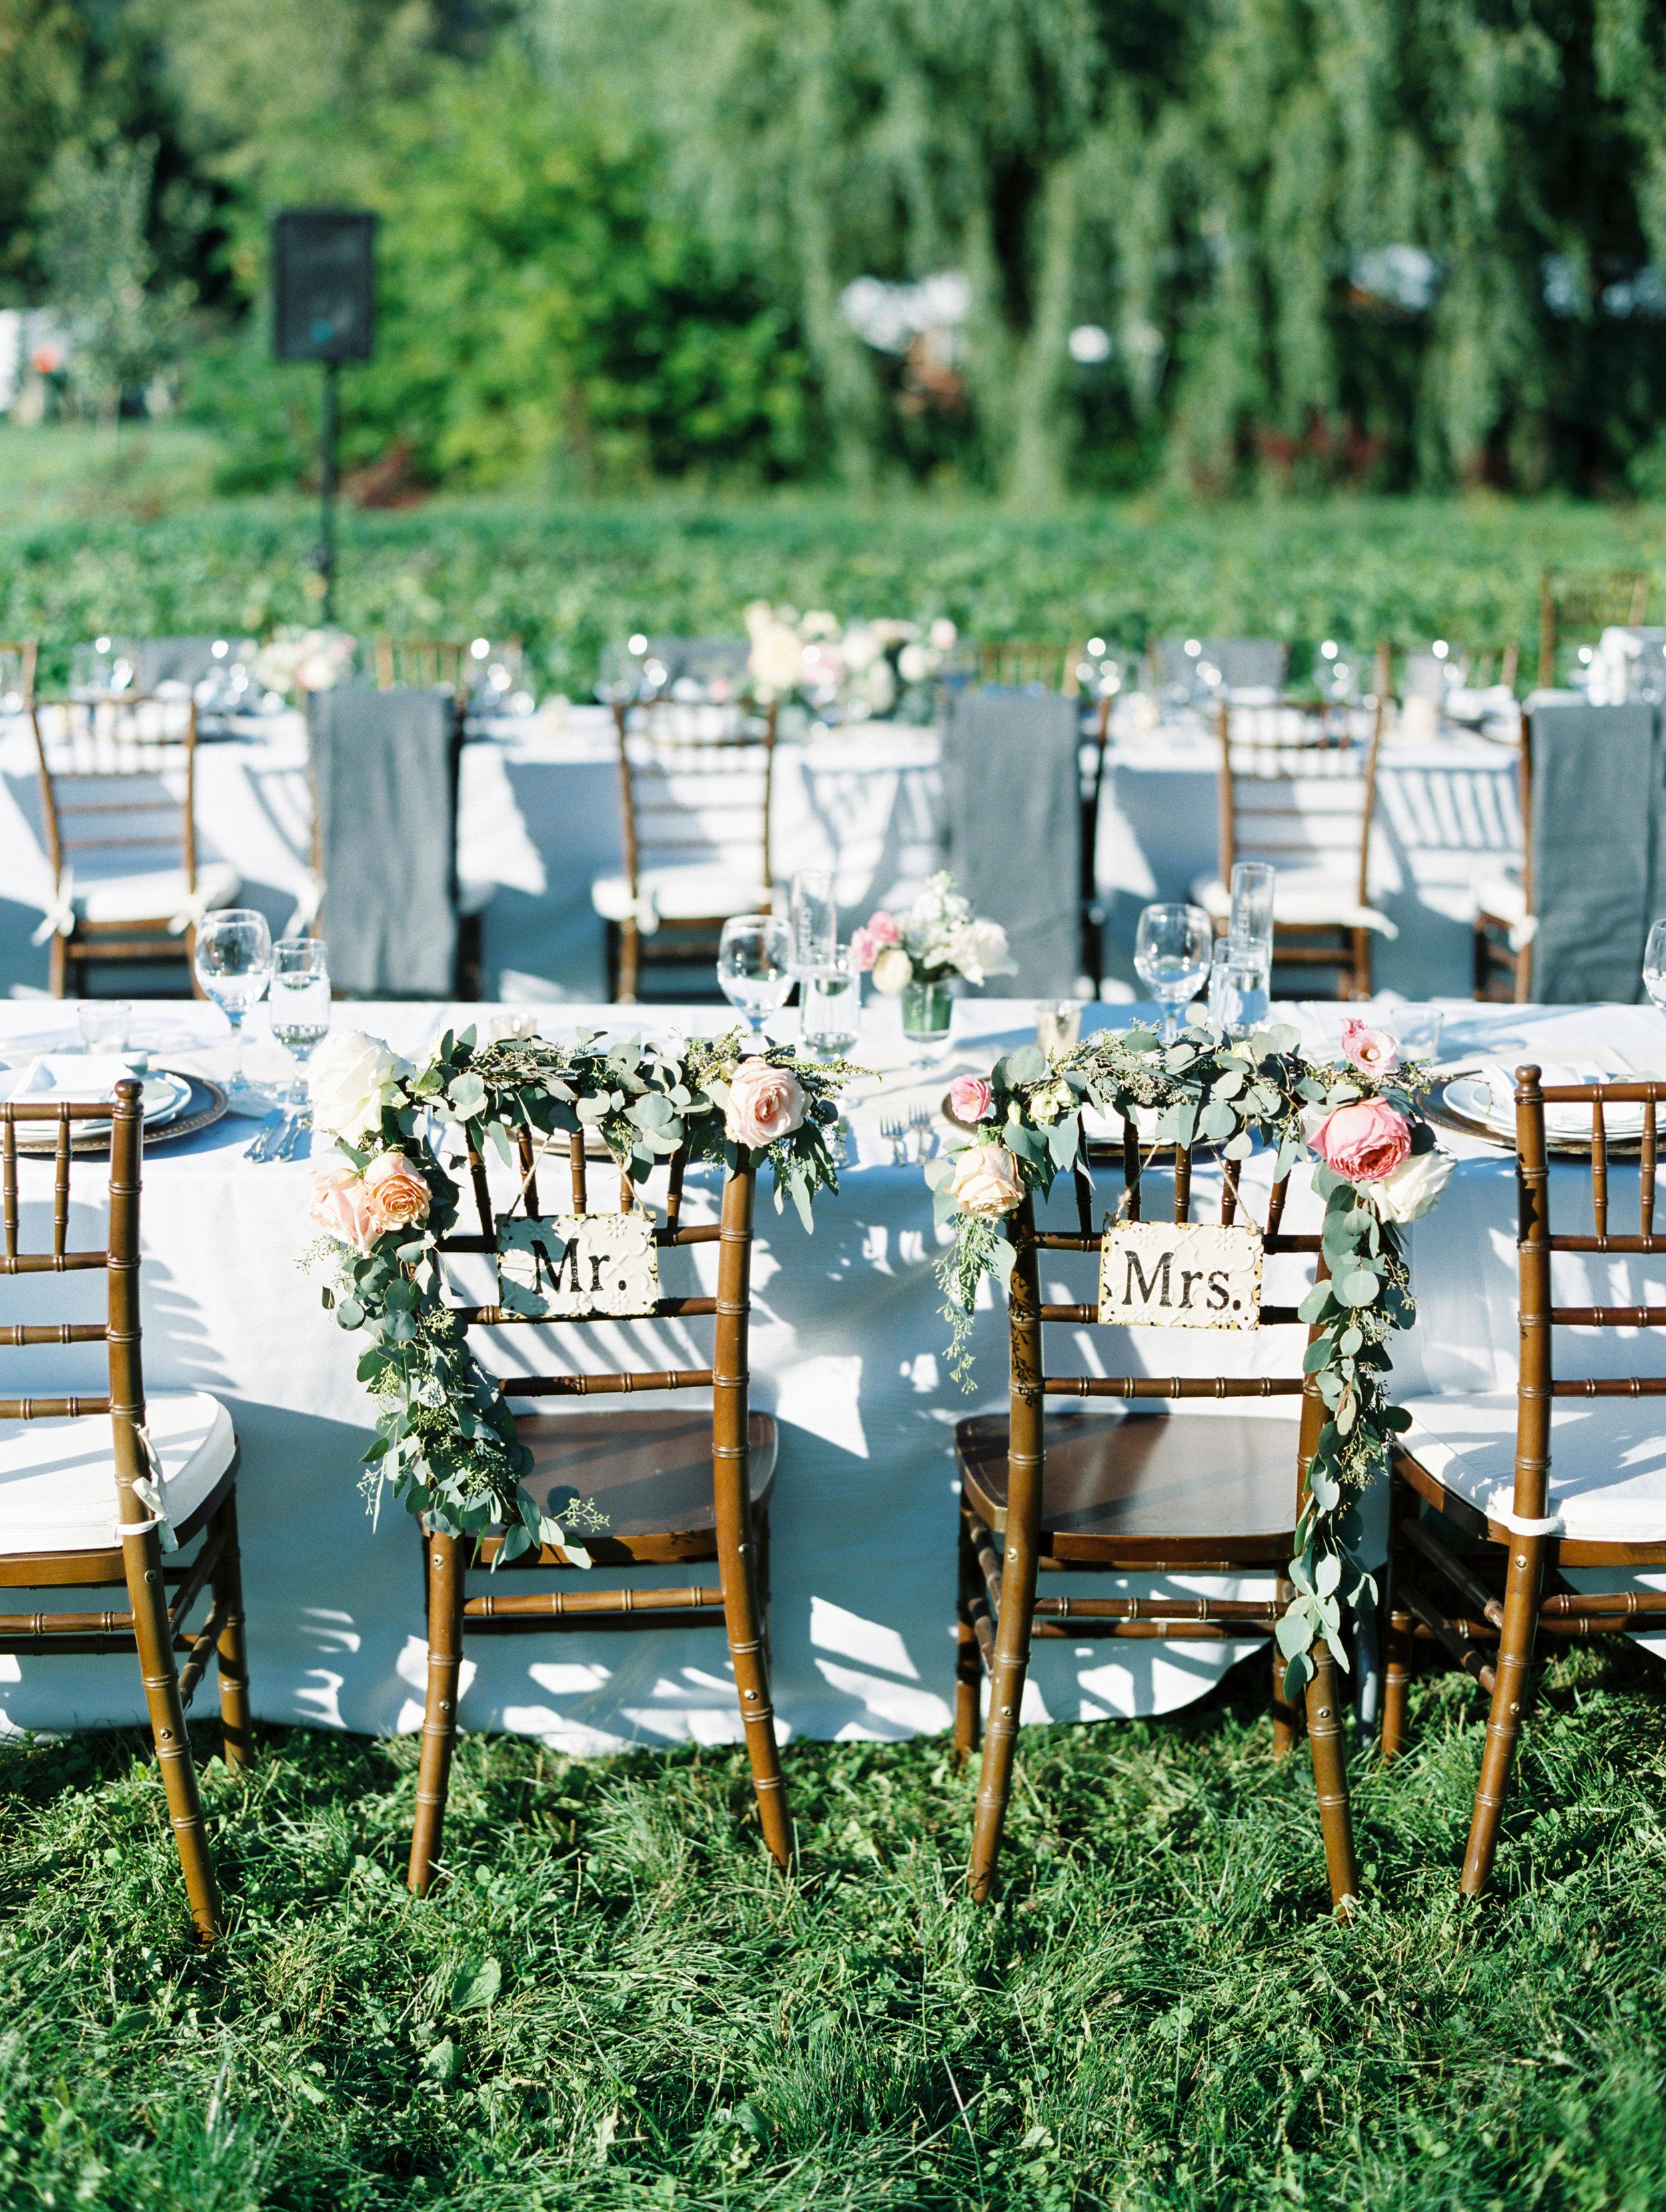 Organic BC Wedding | Christie Graham Photography | Joy Wed blog | http://www.joy-wed.com